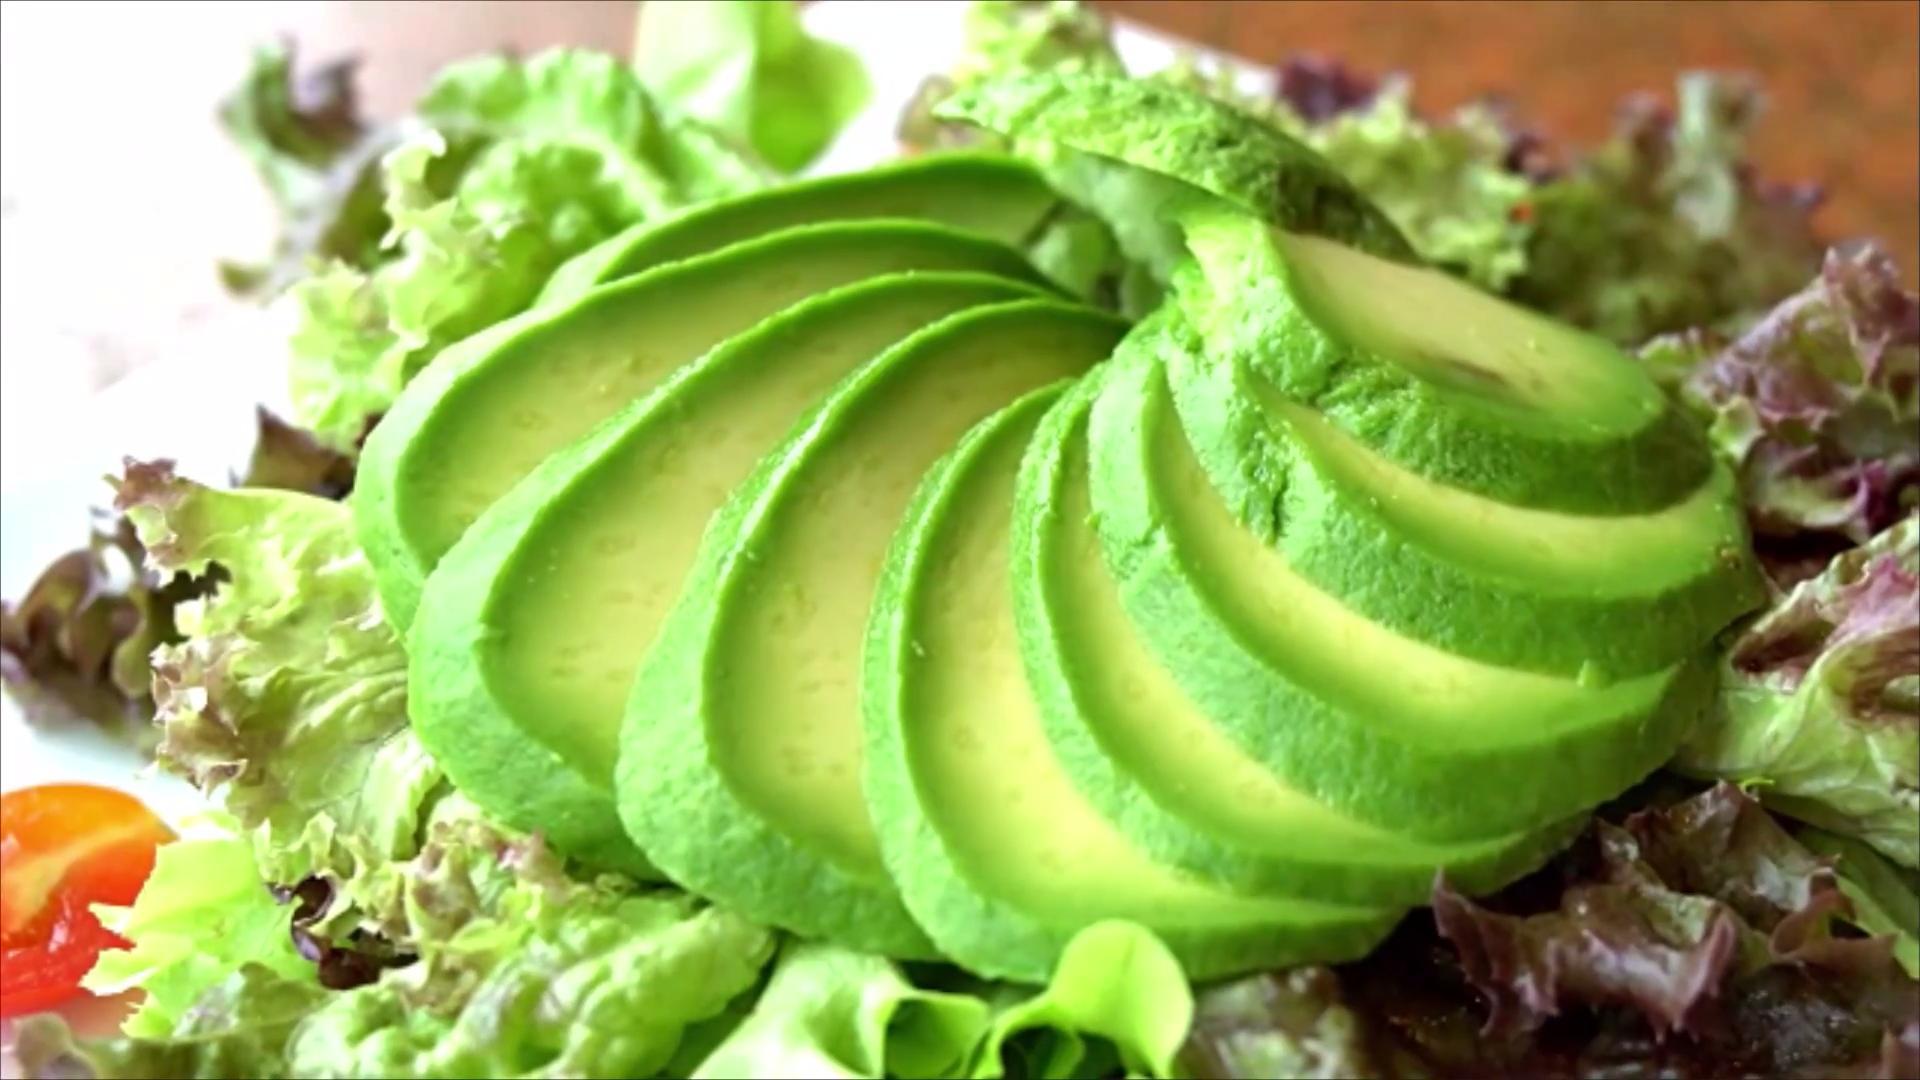 5 Ways to Use Avocados—Besides on Toast